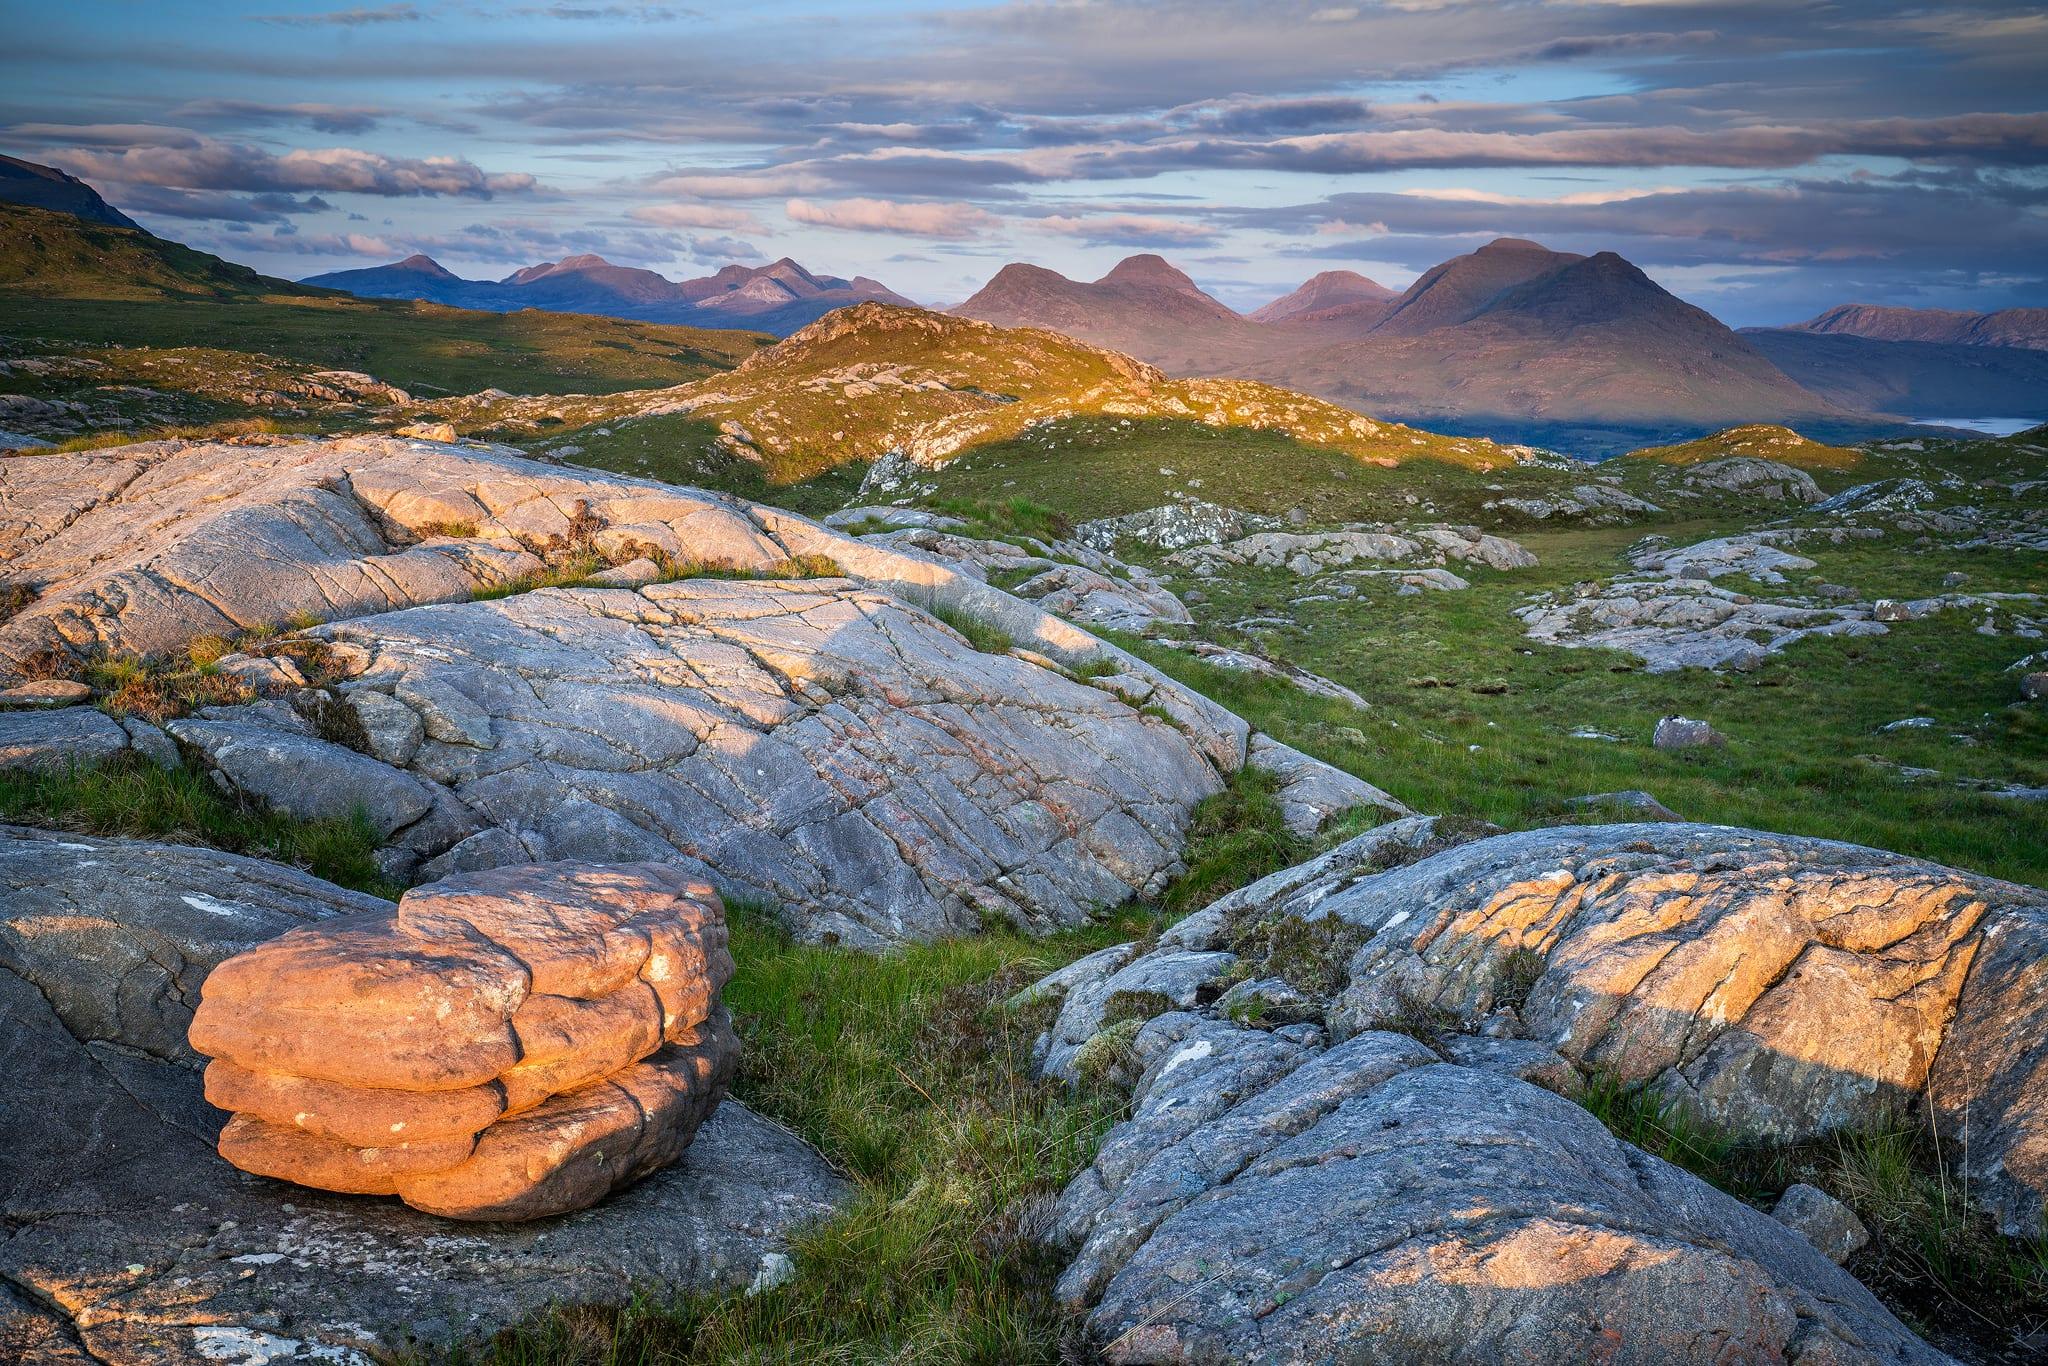 Torridon Sandstone Vista – Scotland Landscape Photography